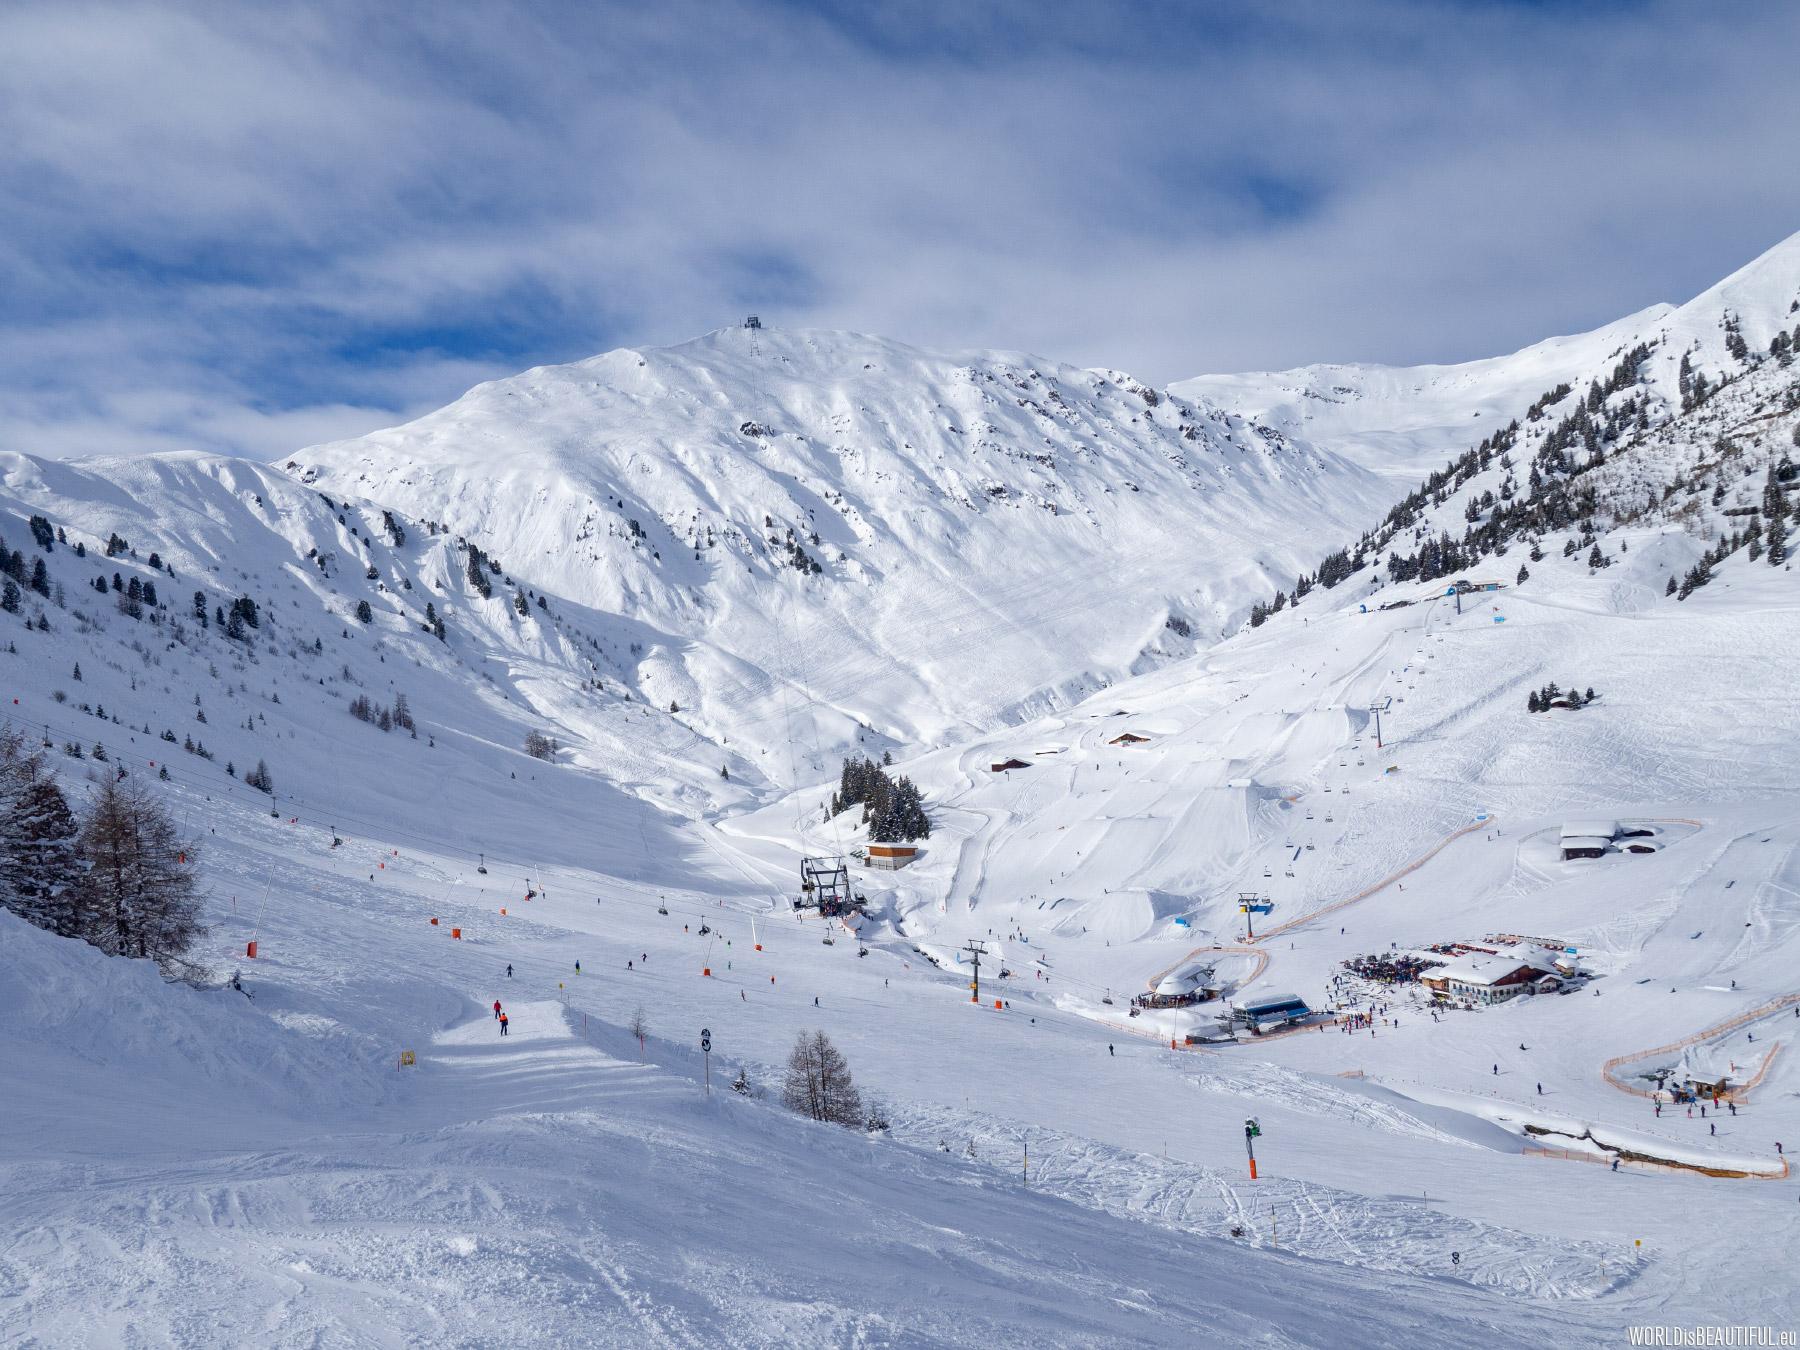 Ośrodek narciarski Mayrhofen